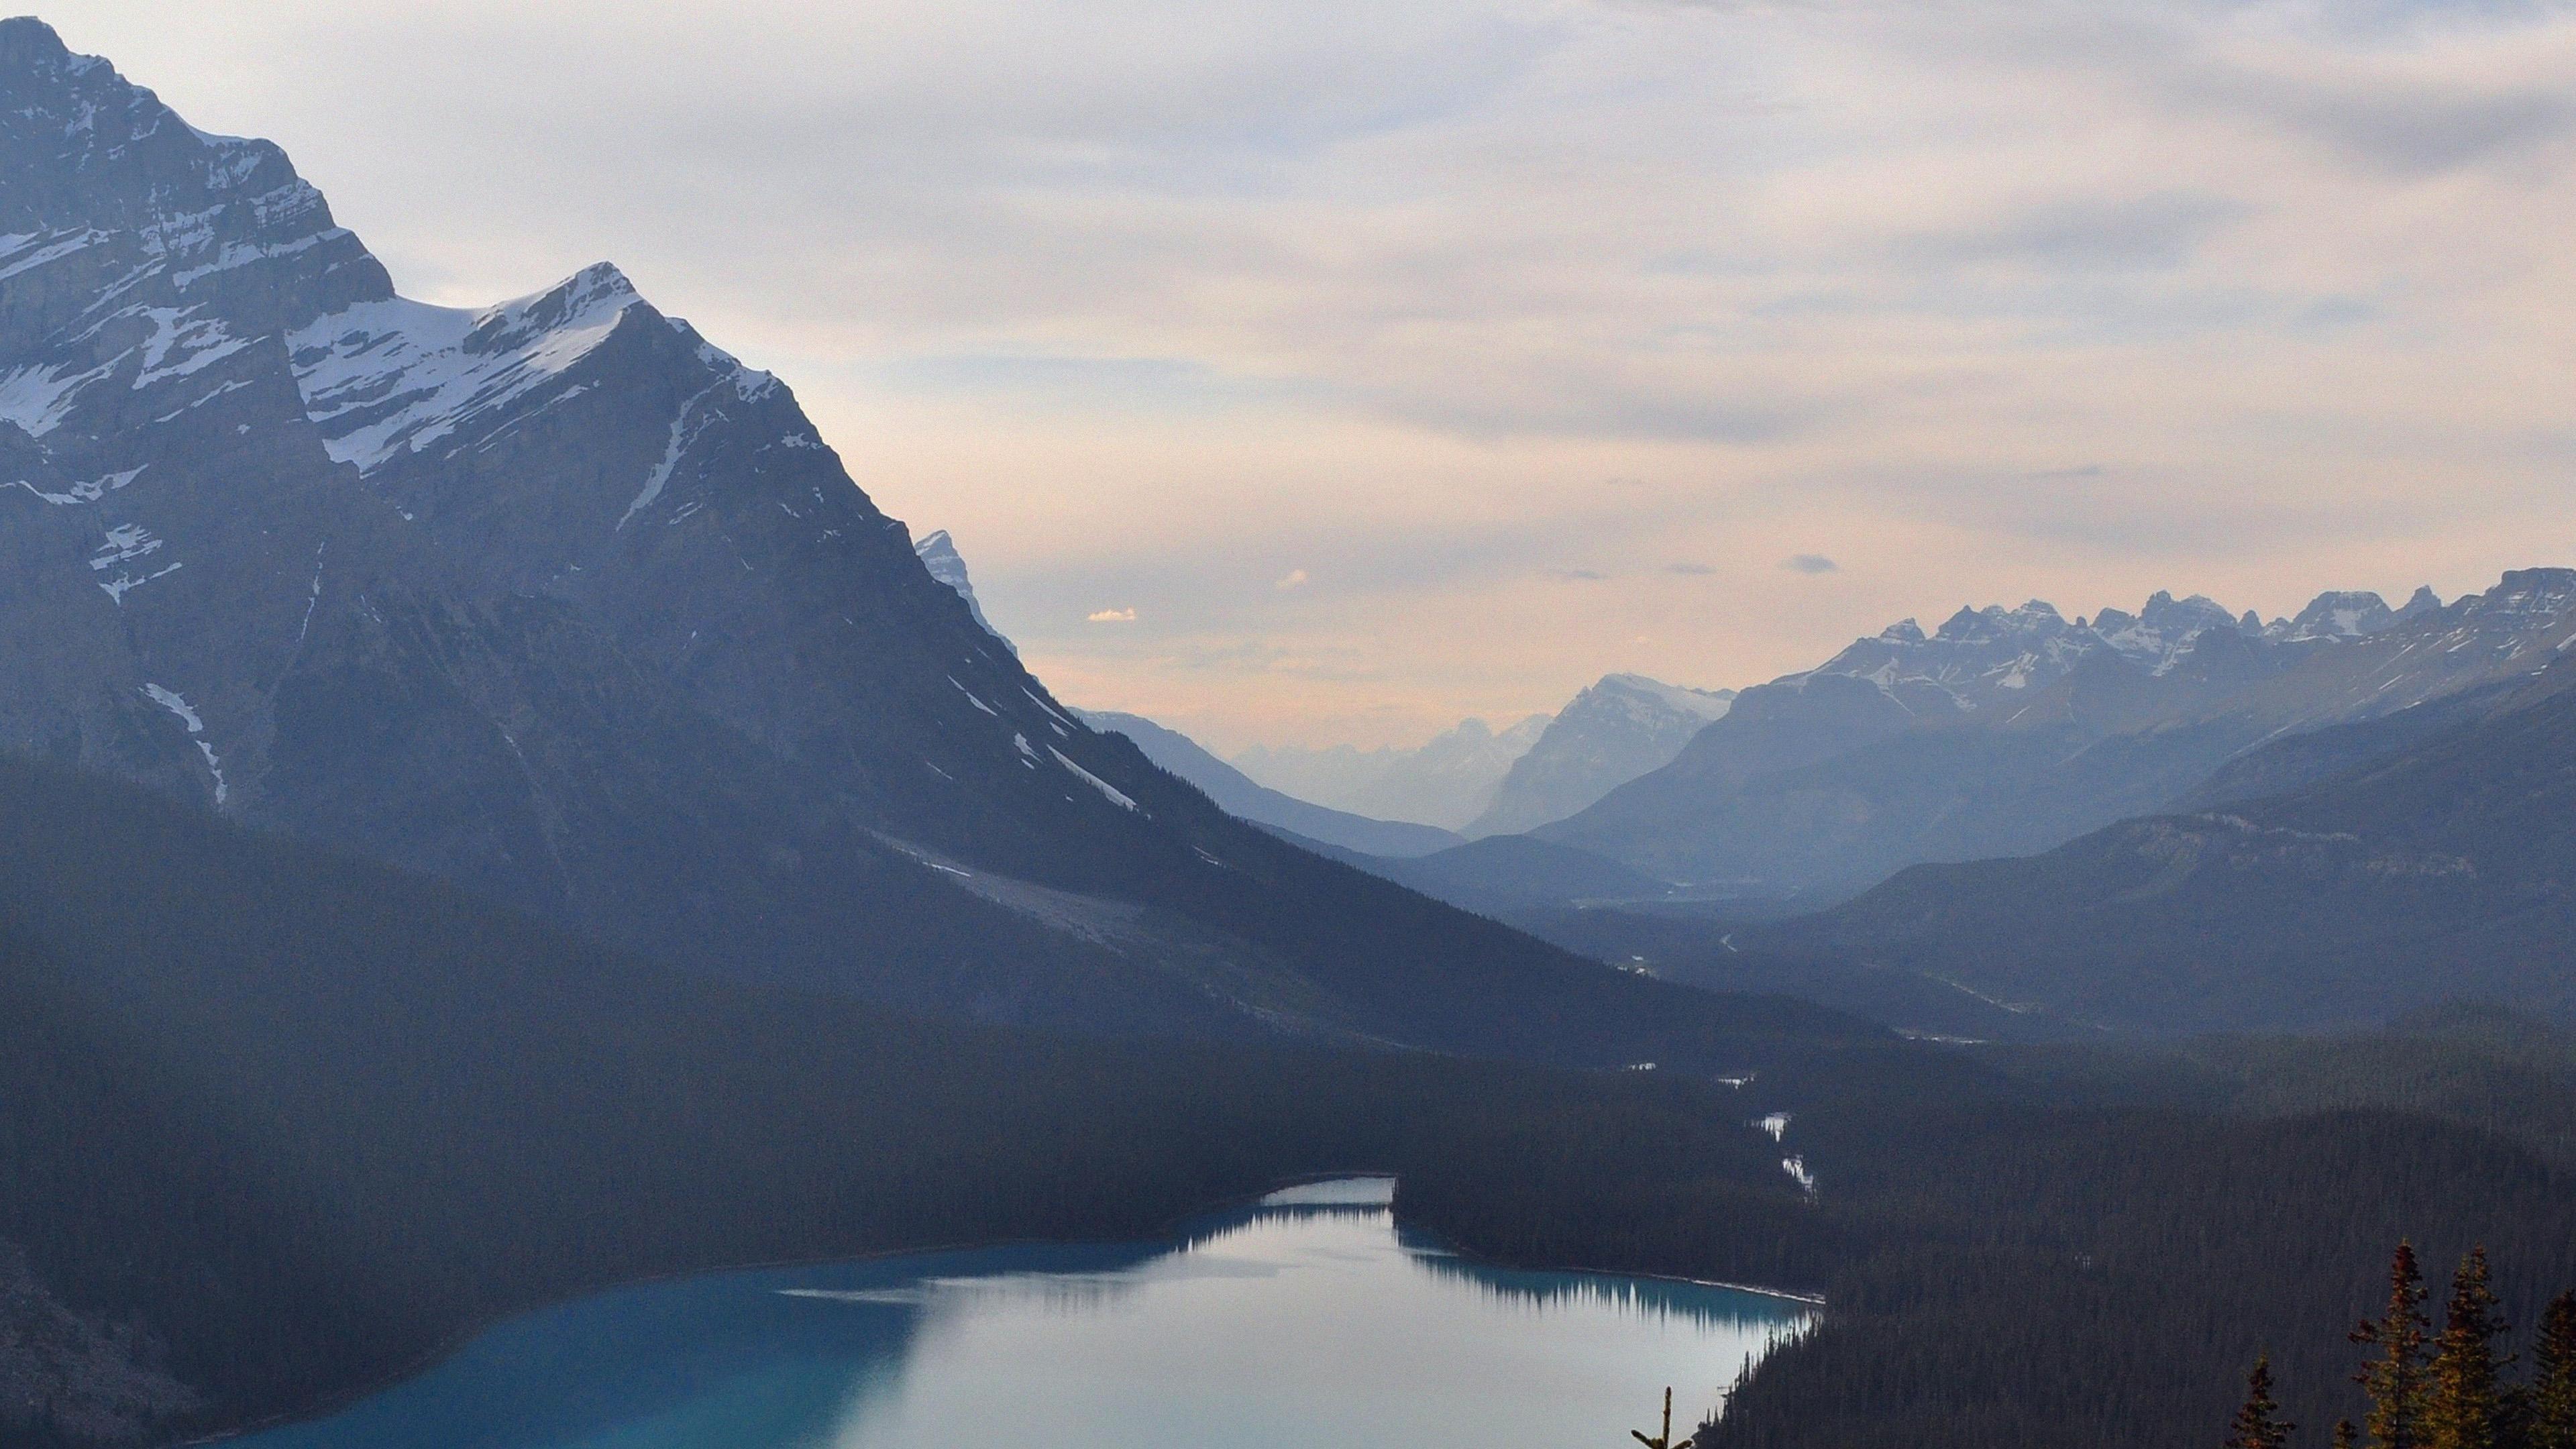 wallpaper for desktop, laptop   na95-lake-mountain-sky ...